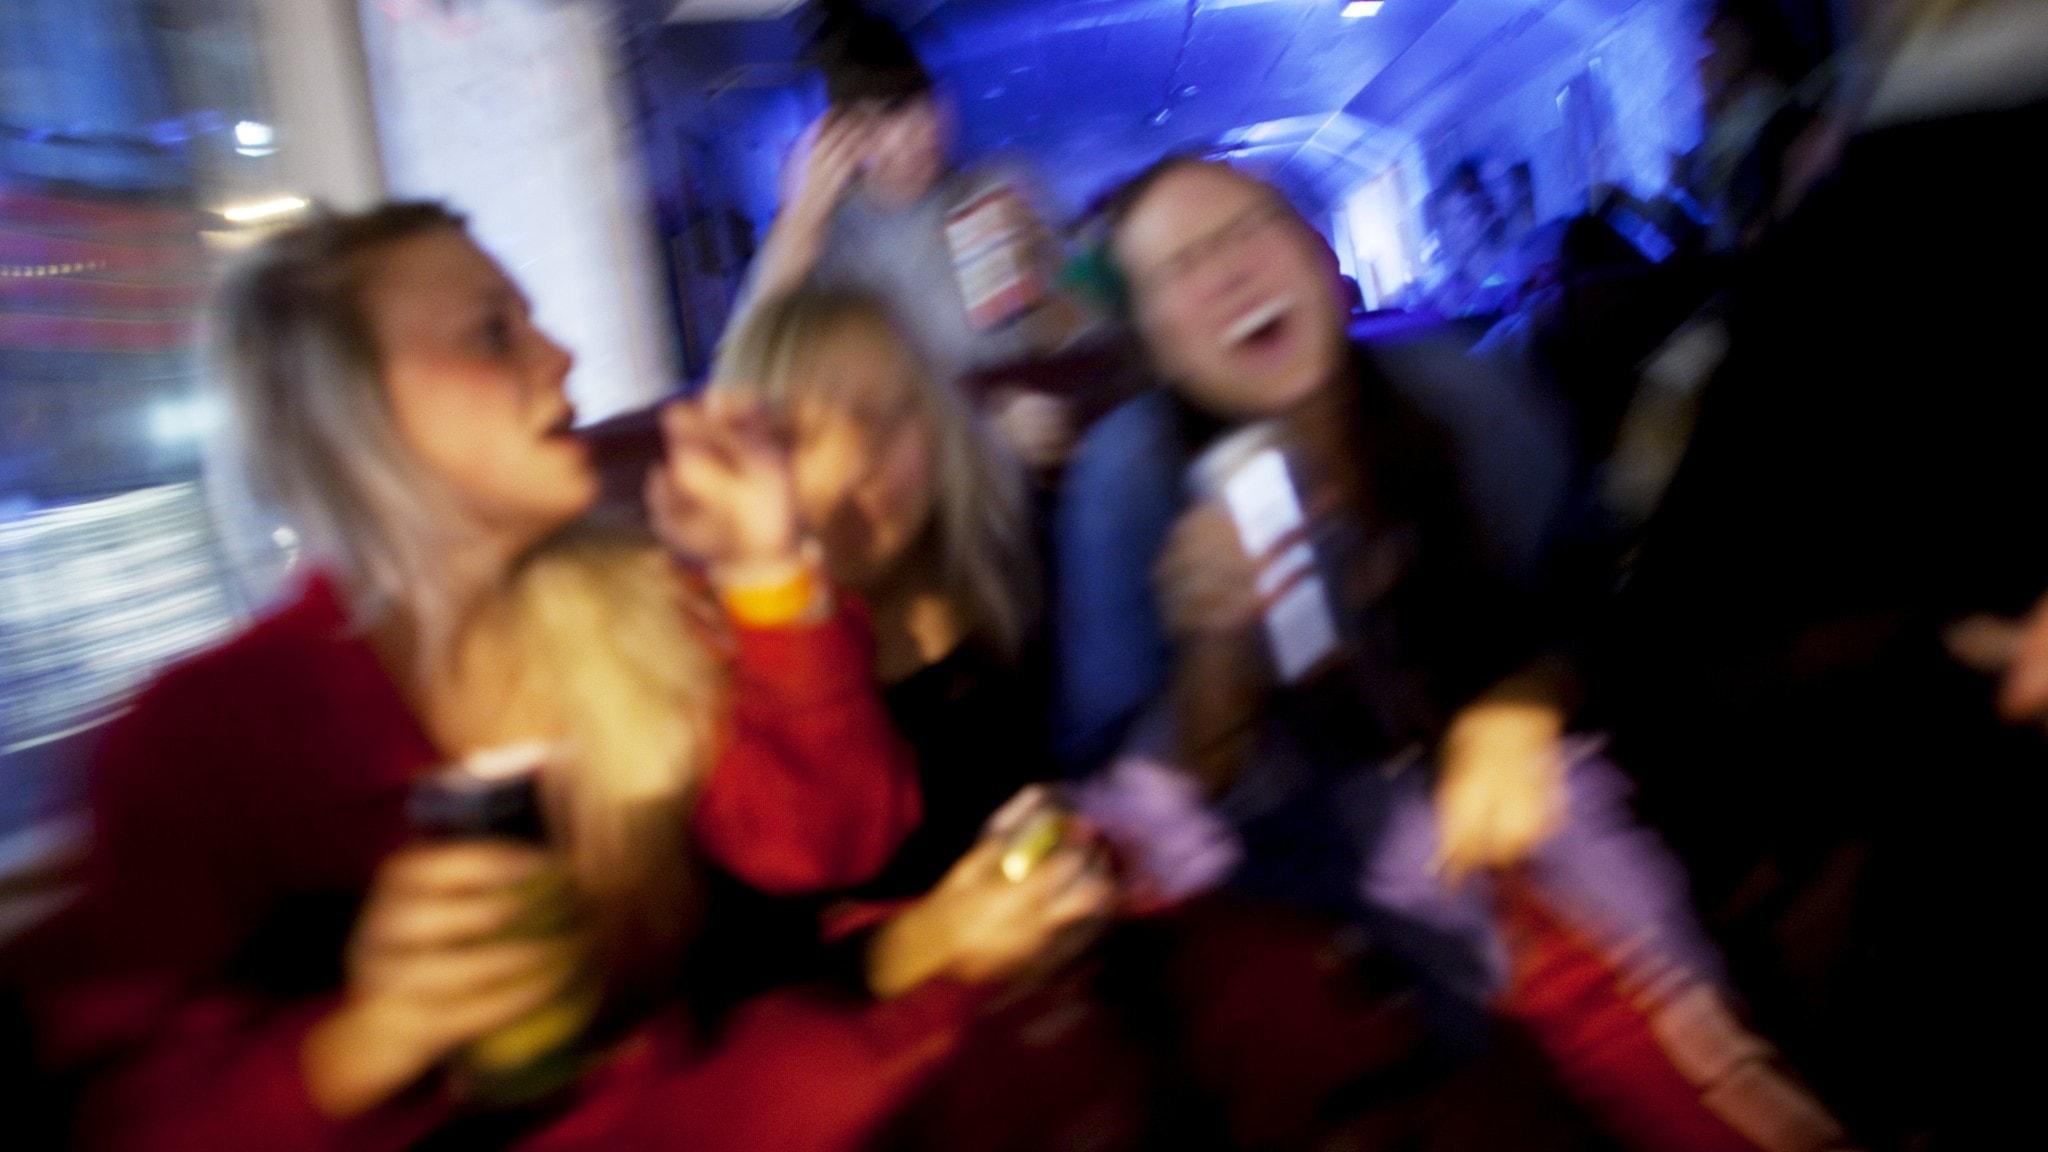 På fotot syns personer som festar.